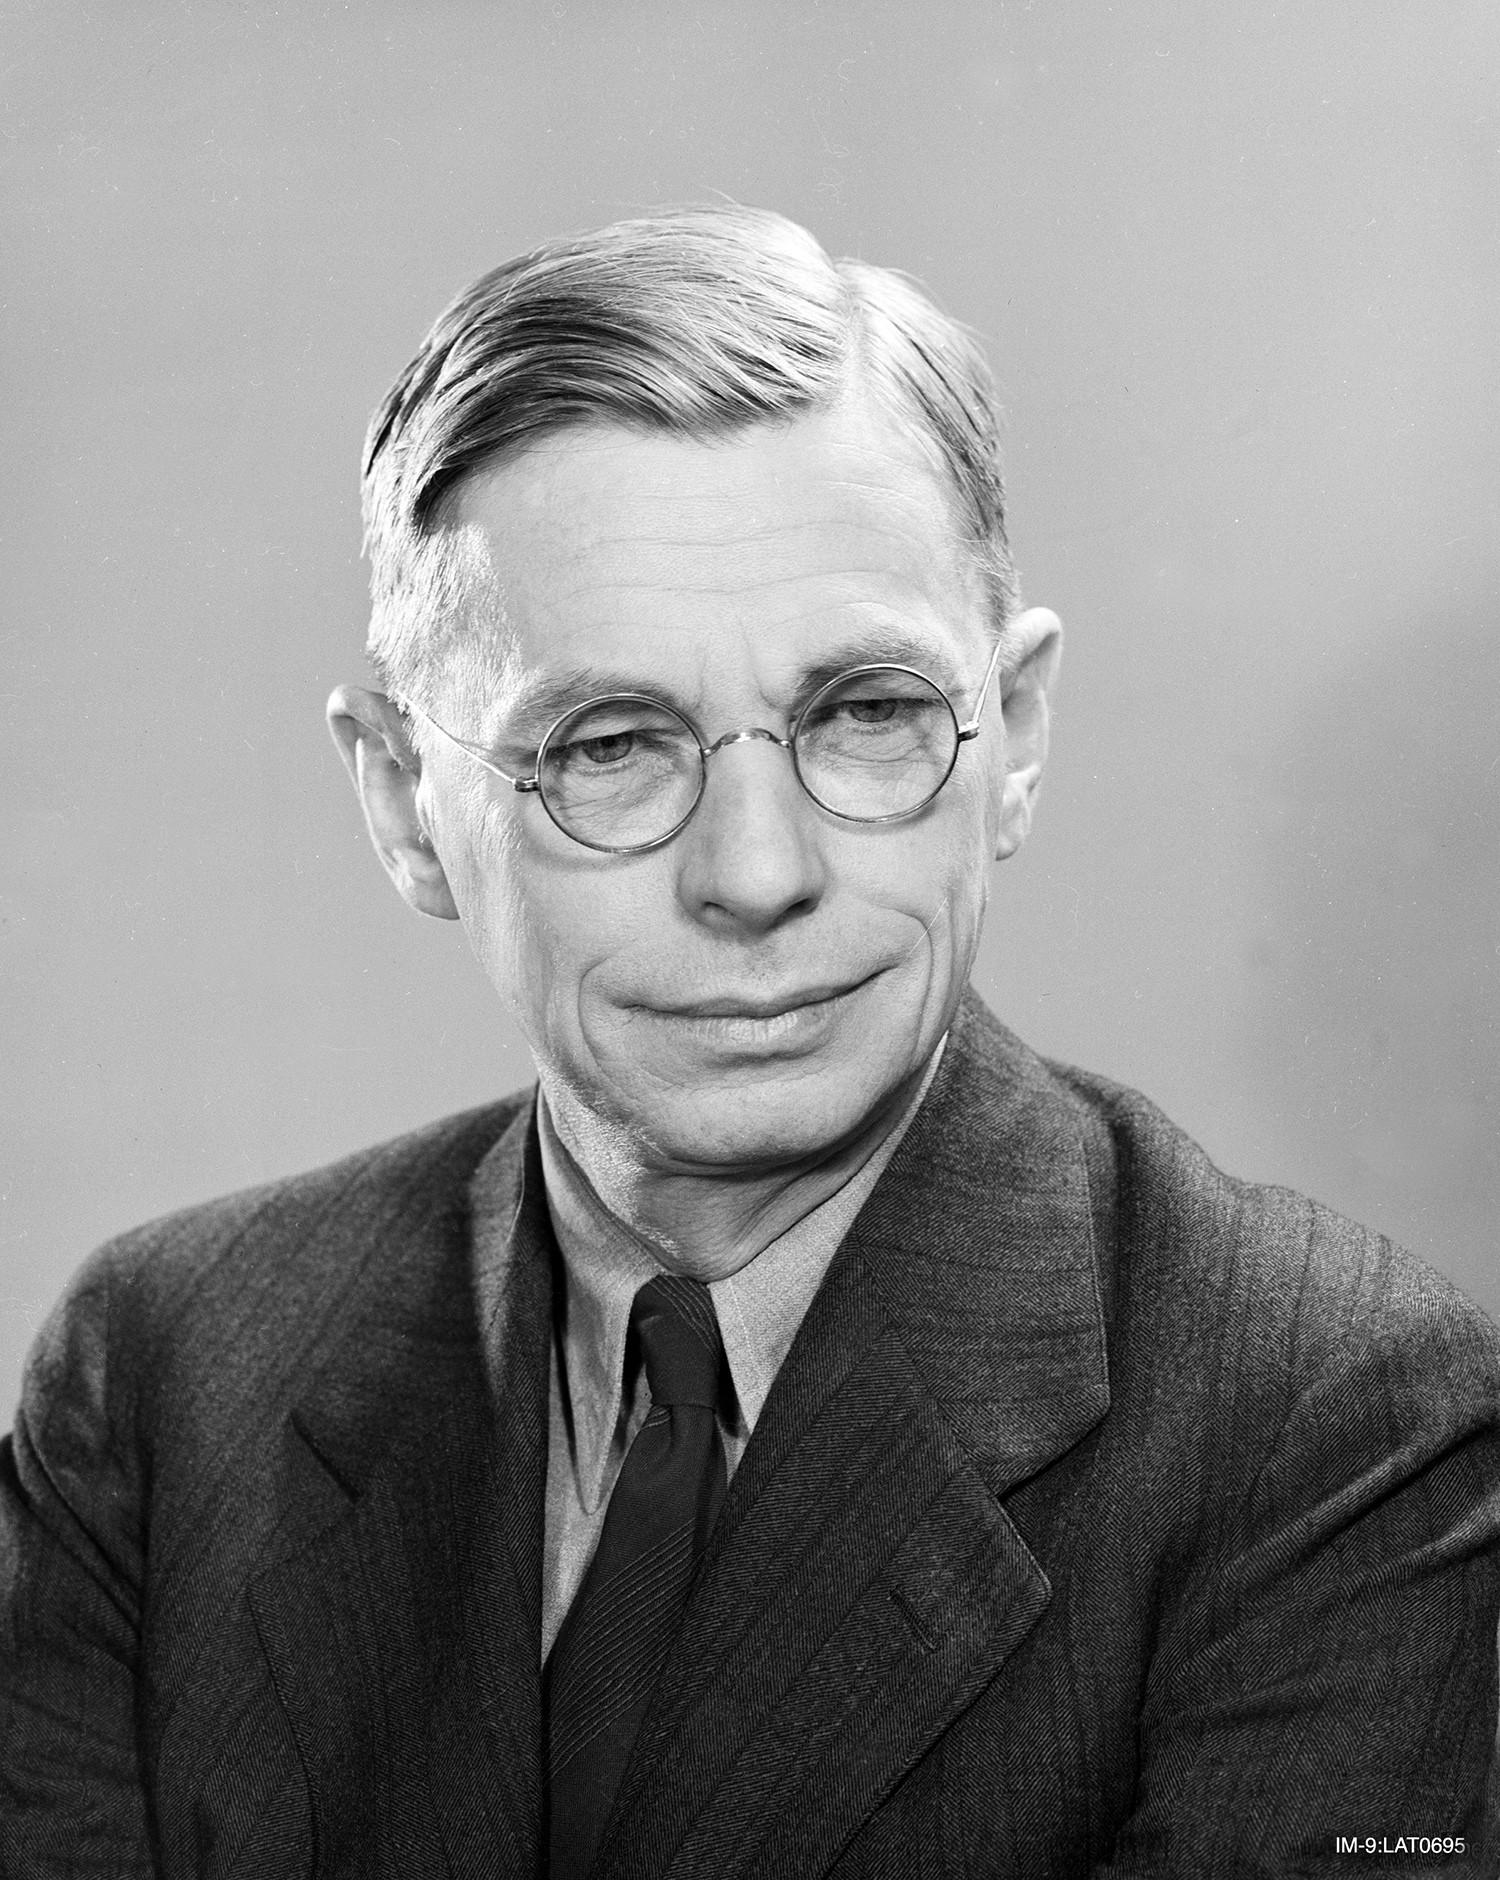 James Conant, President of Harvard University